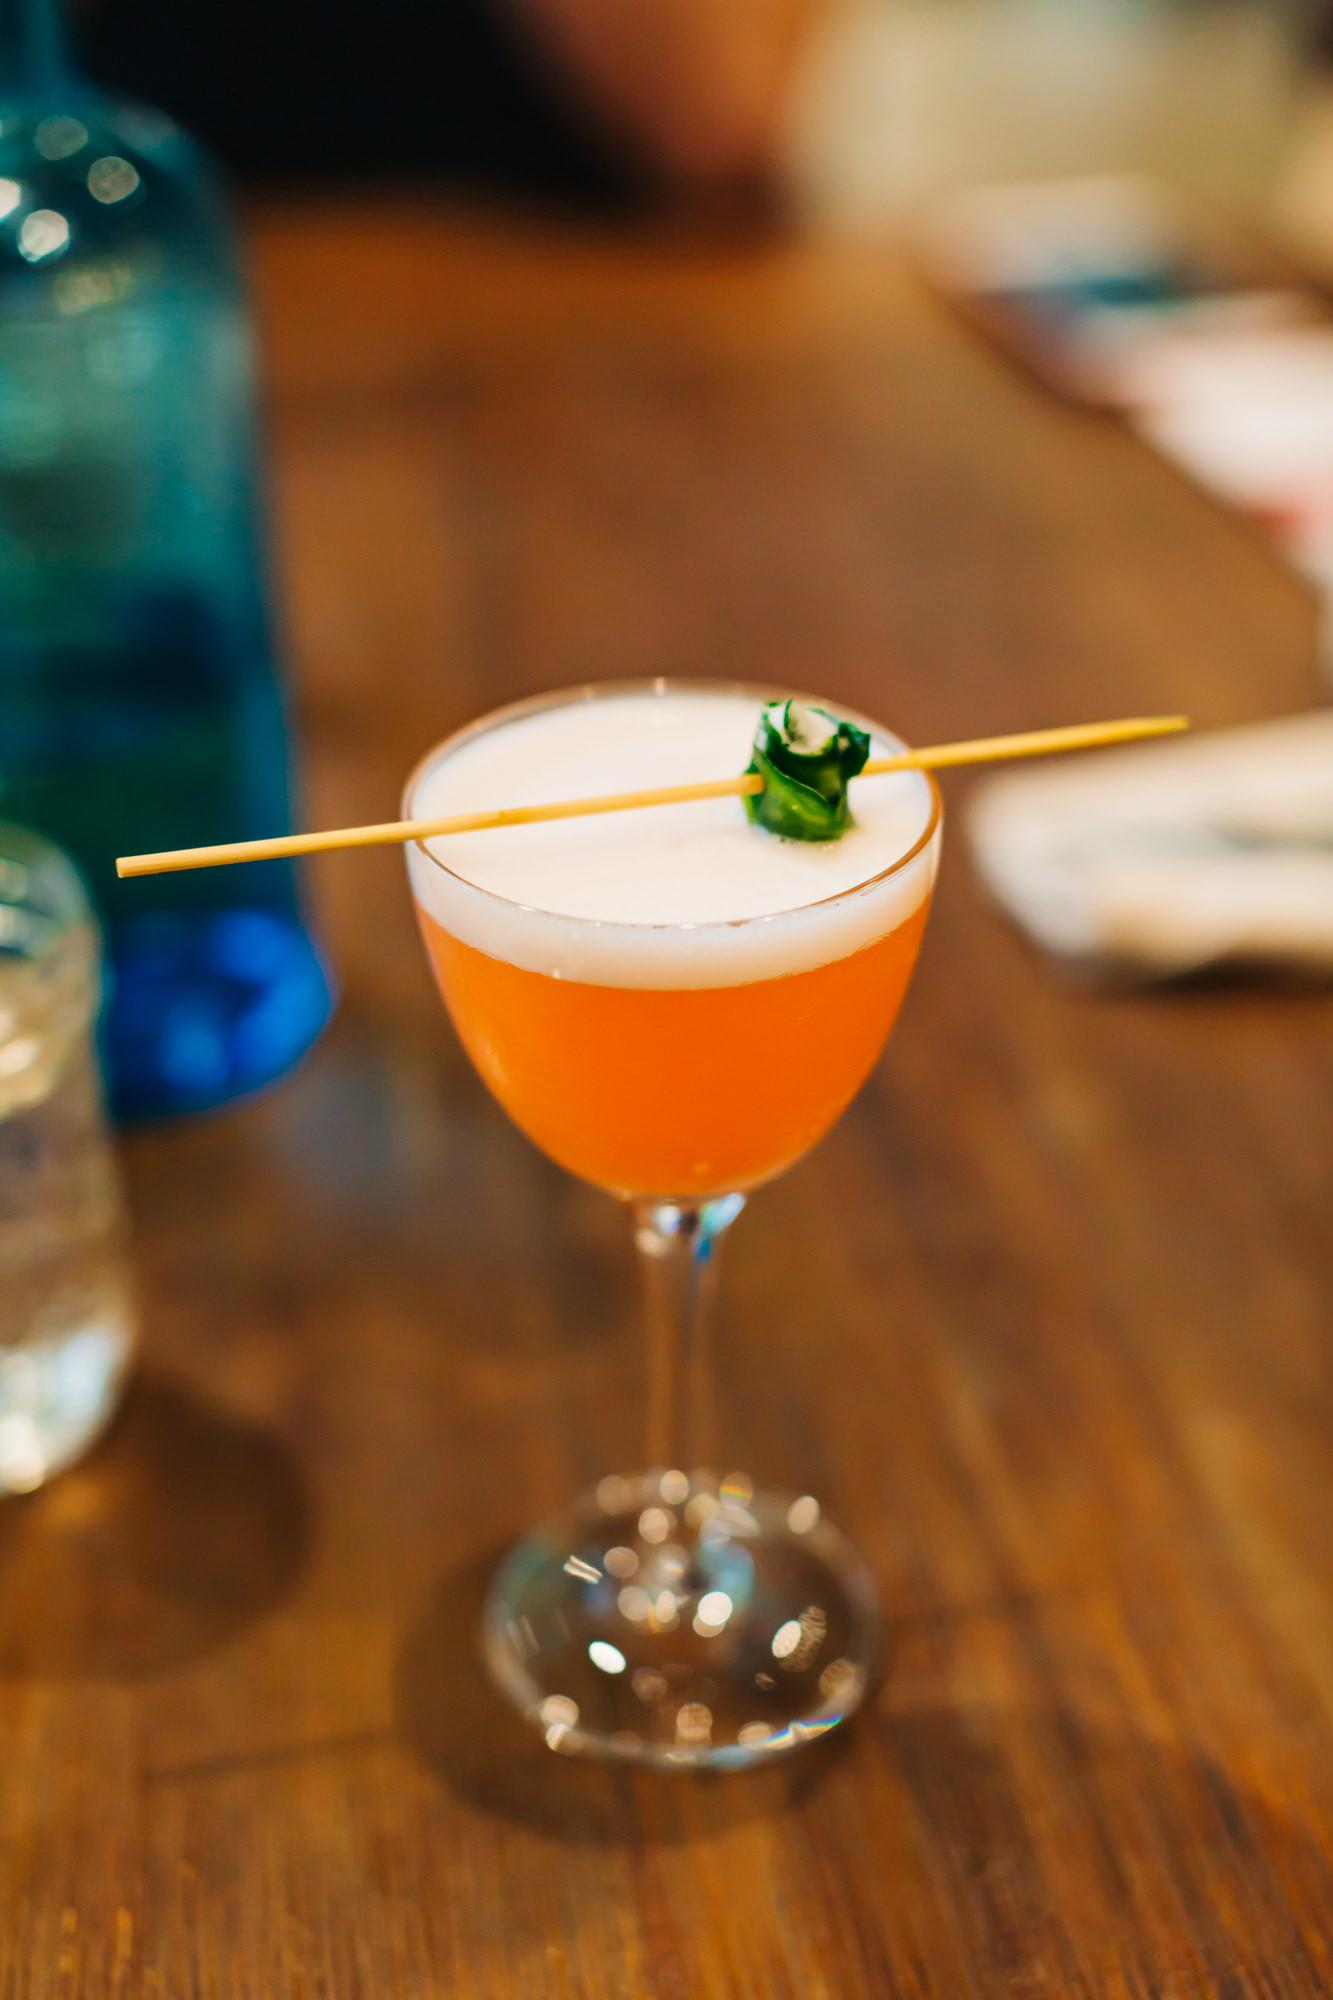 The Perfect Pear - Eau Claire Equinox Vodka, Aperol Lemon Juice, Simple Syrup, Egg Whites